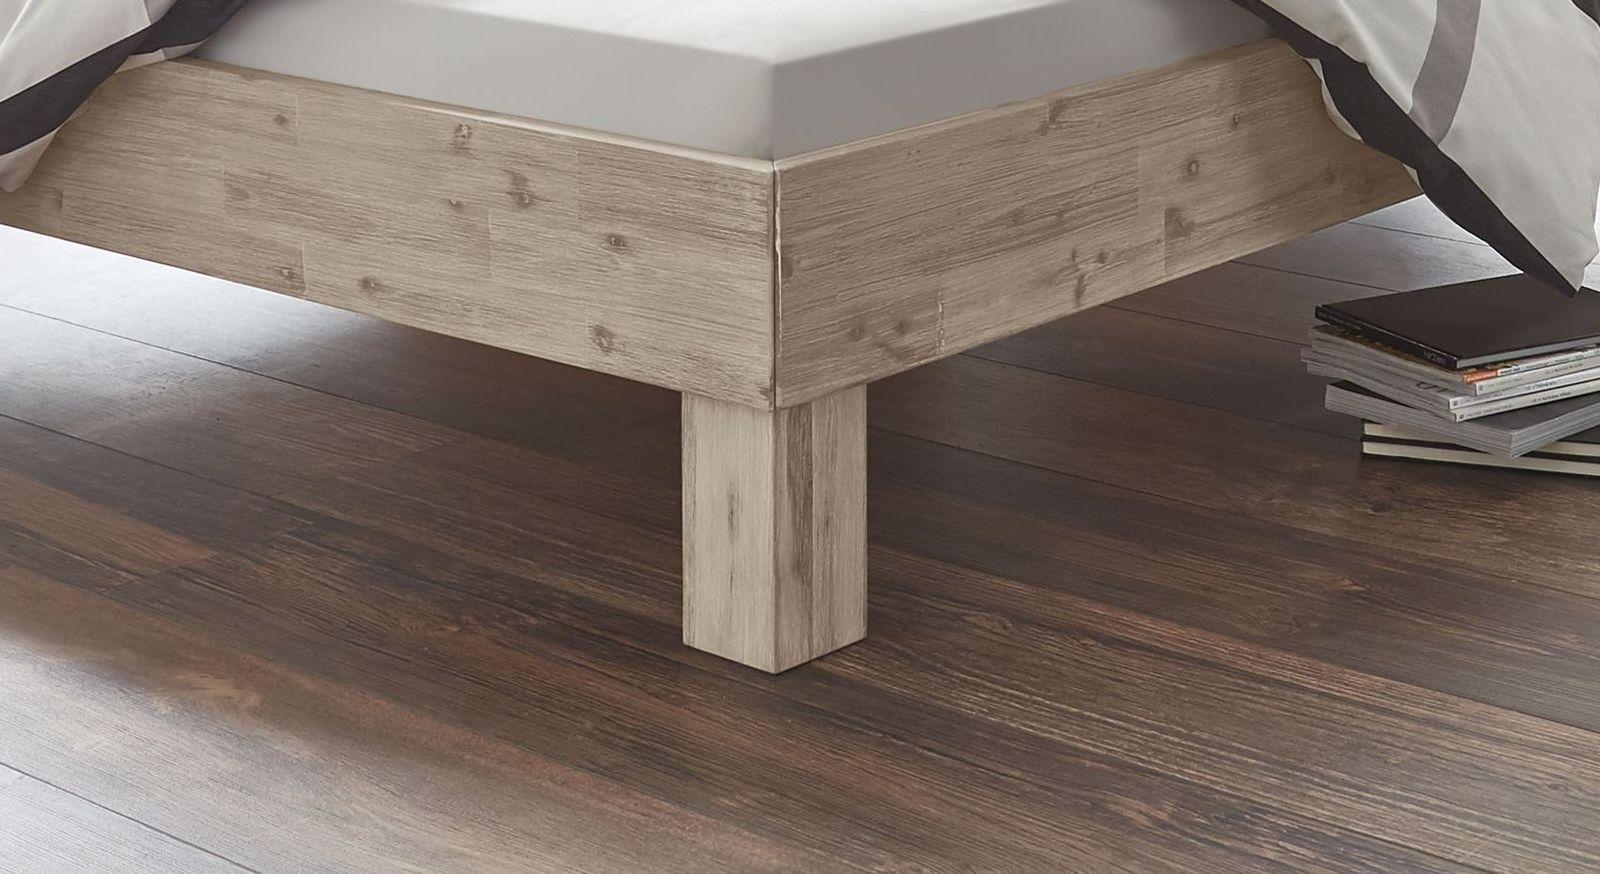 Bett Valtimo mit hohen Bettbeinen aus Massivholz